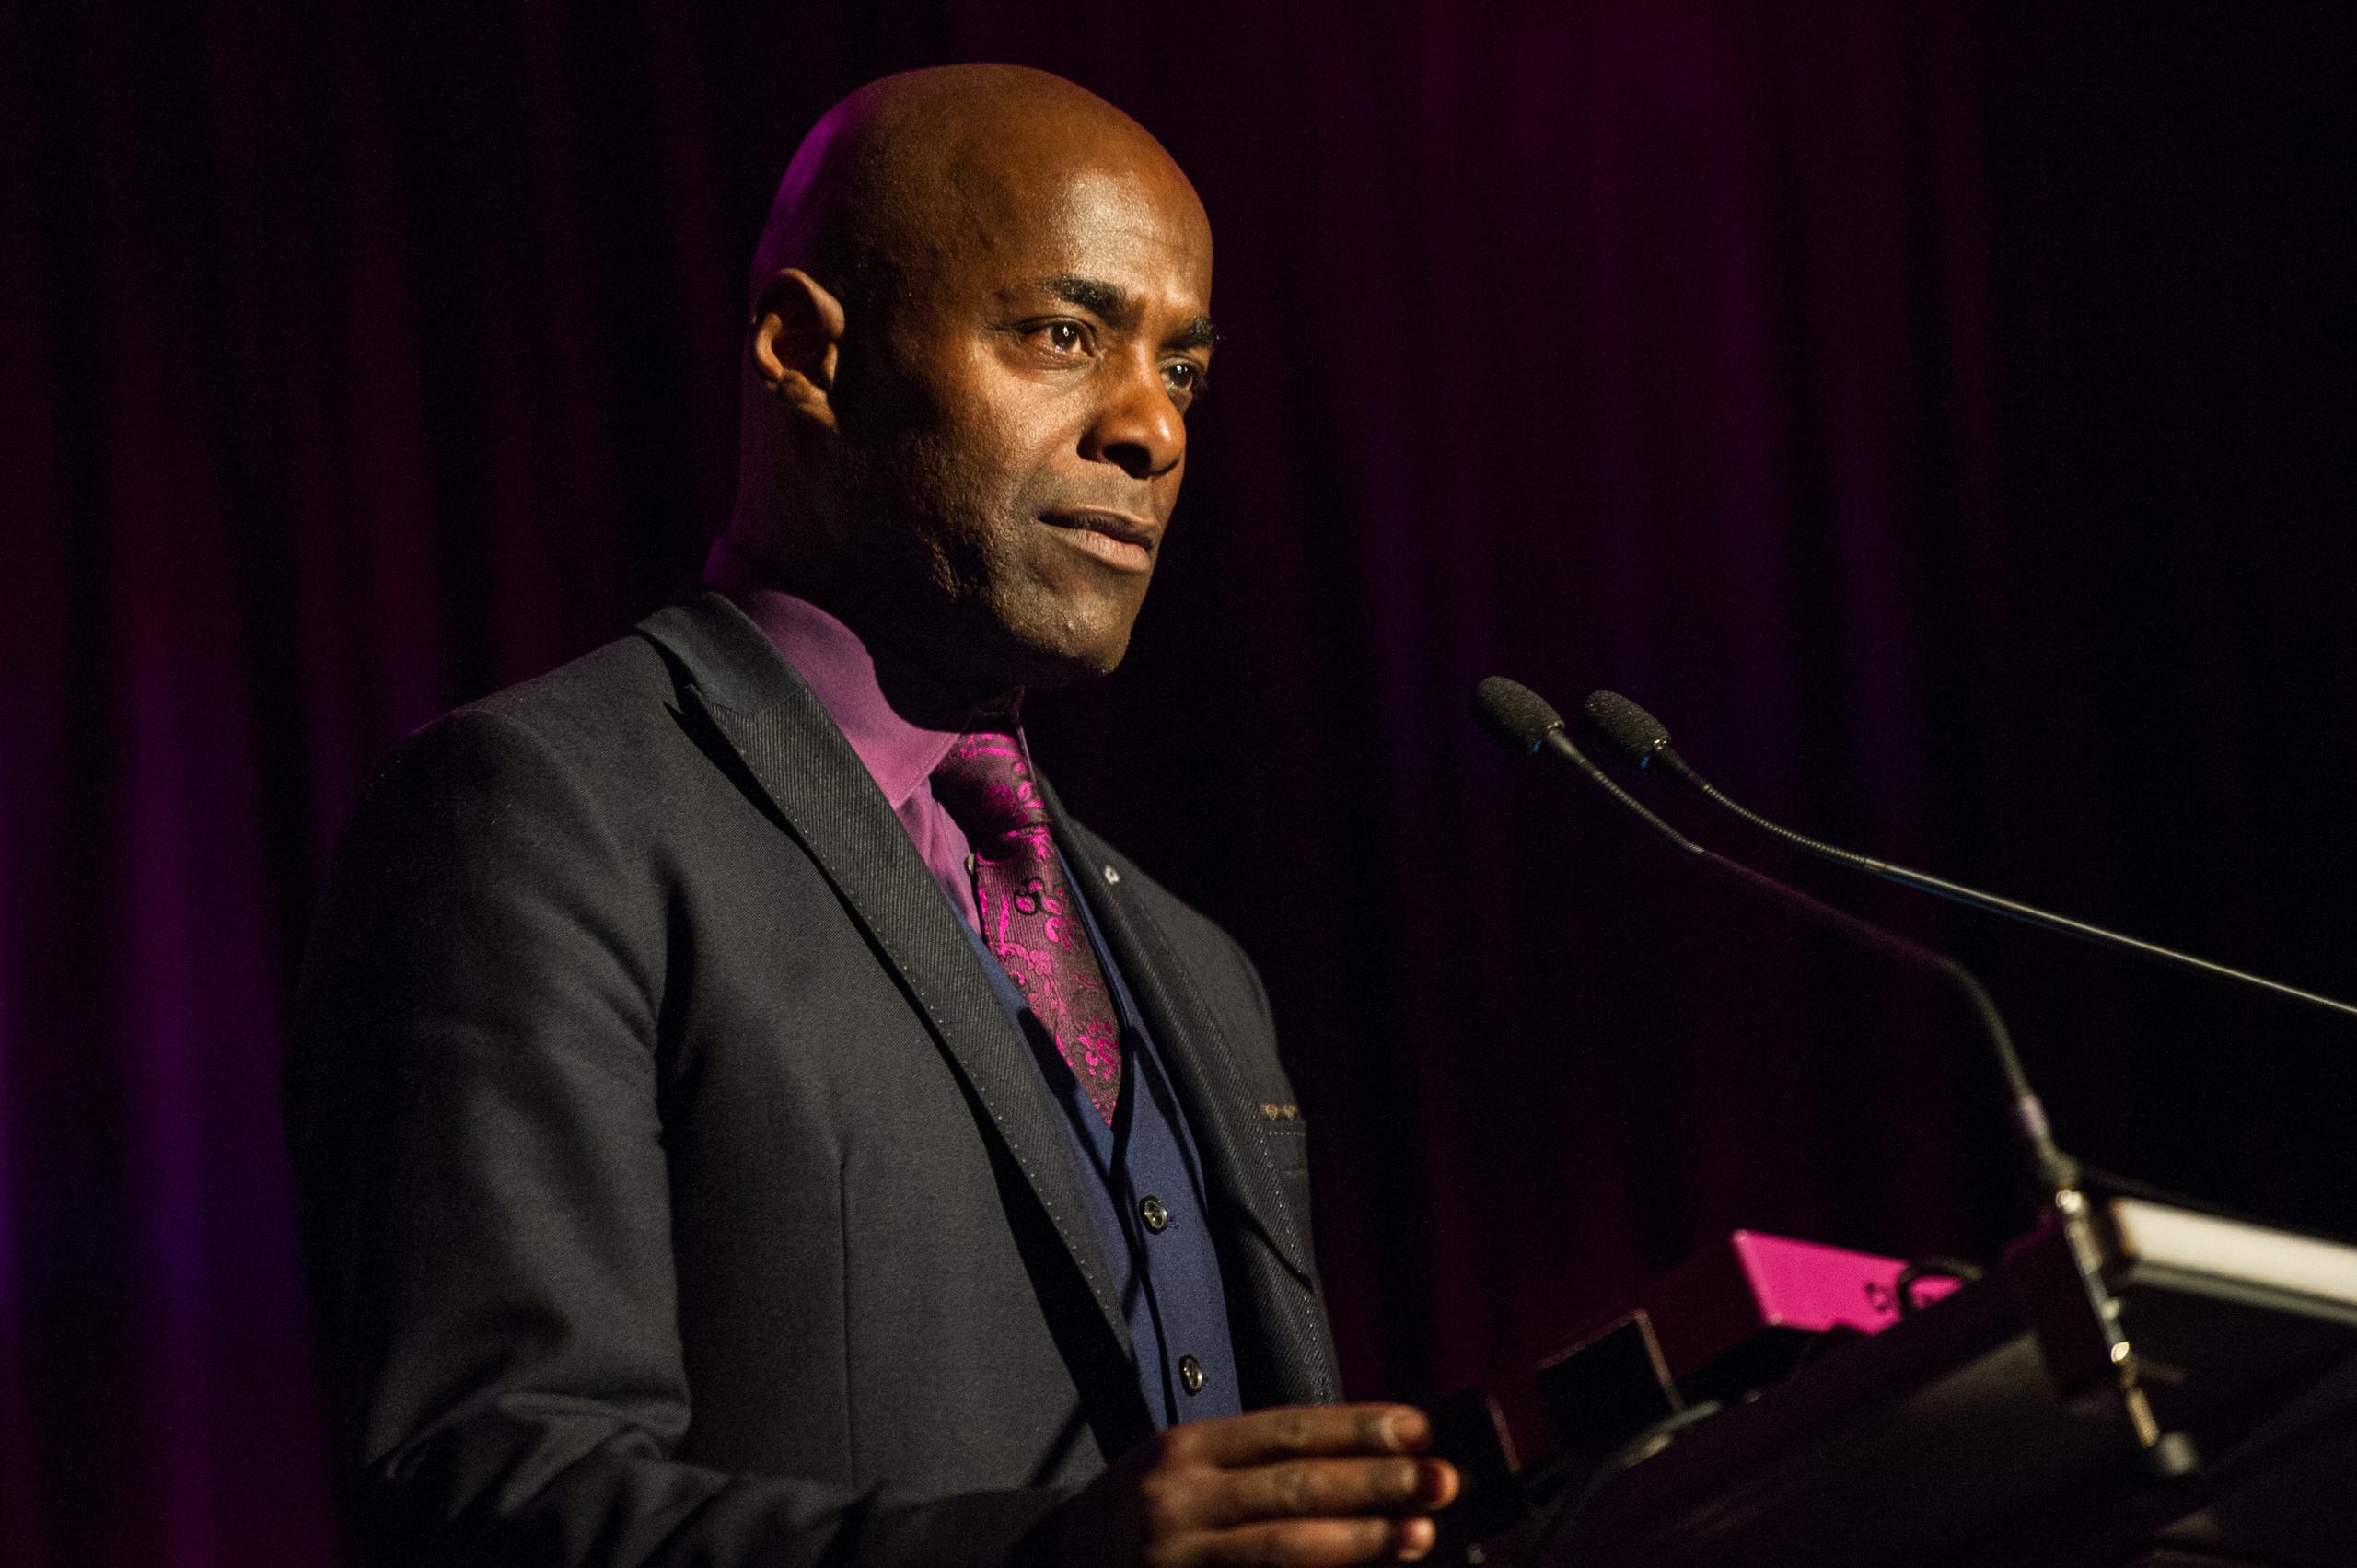 Paterson Joseph speaks during Amnesty International UK in London on June 3, 2015.